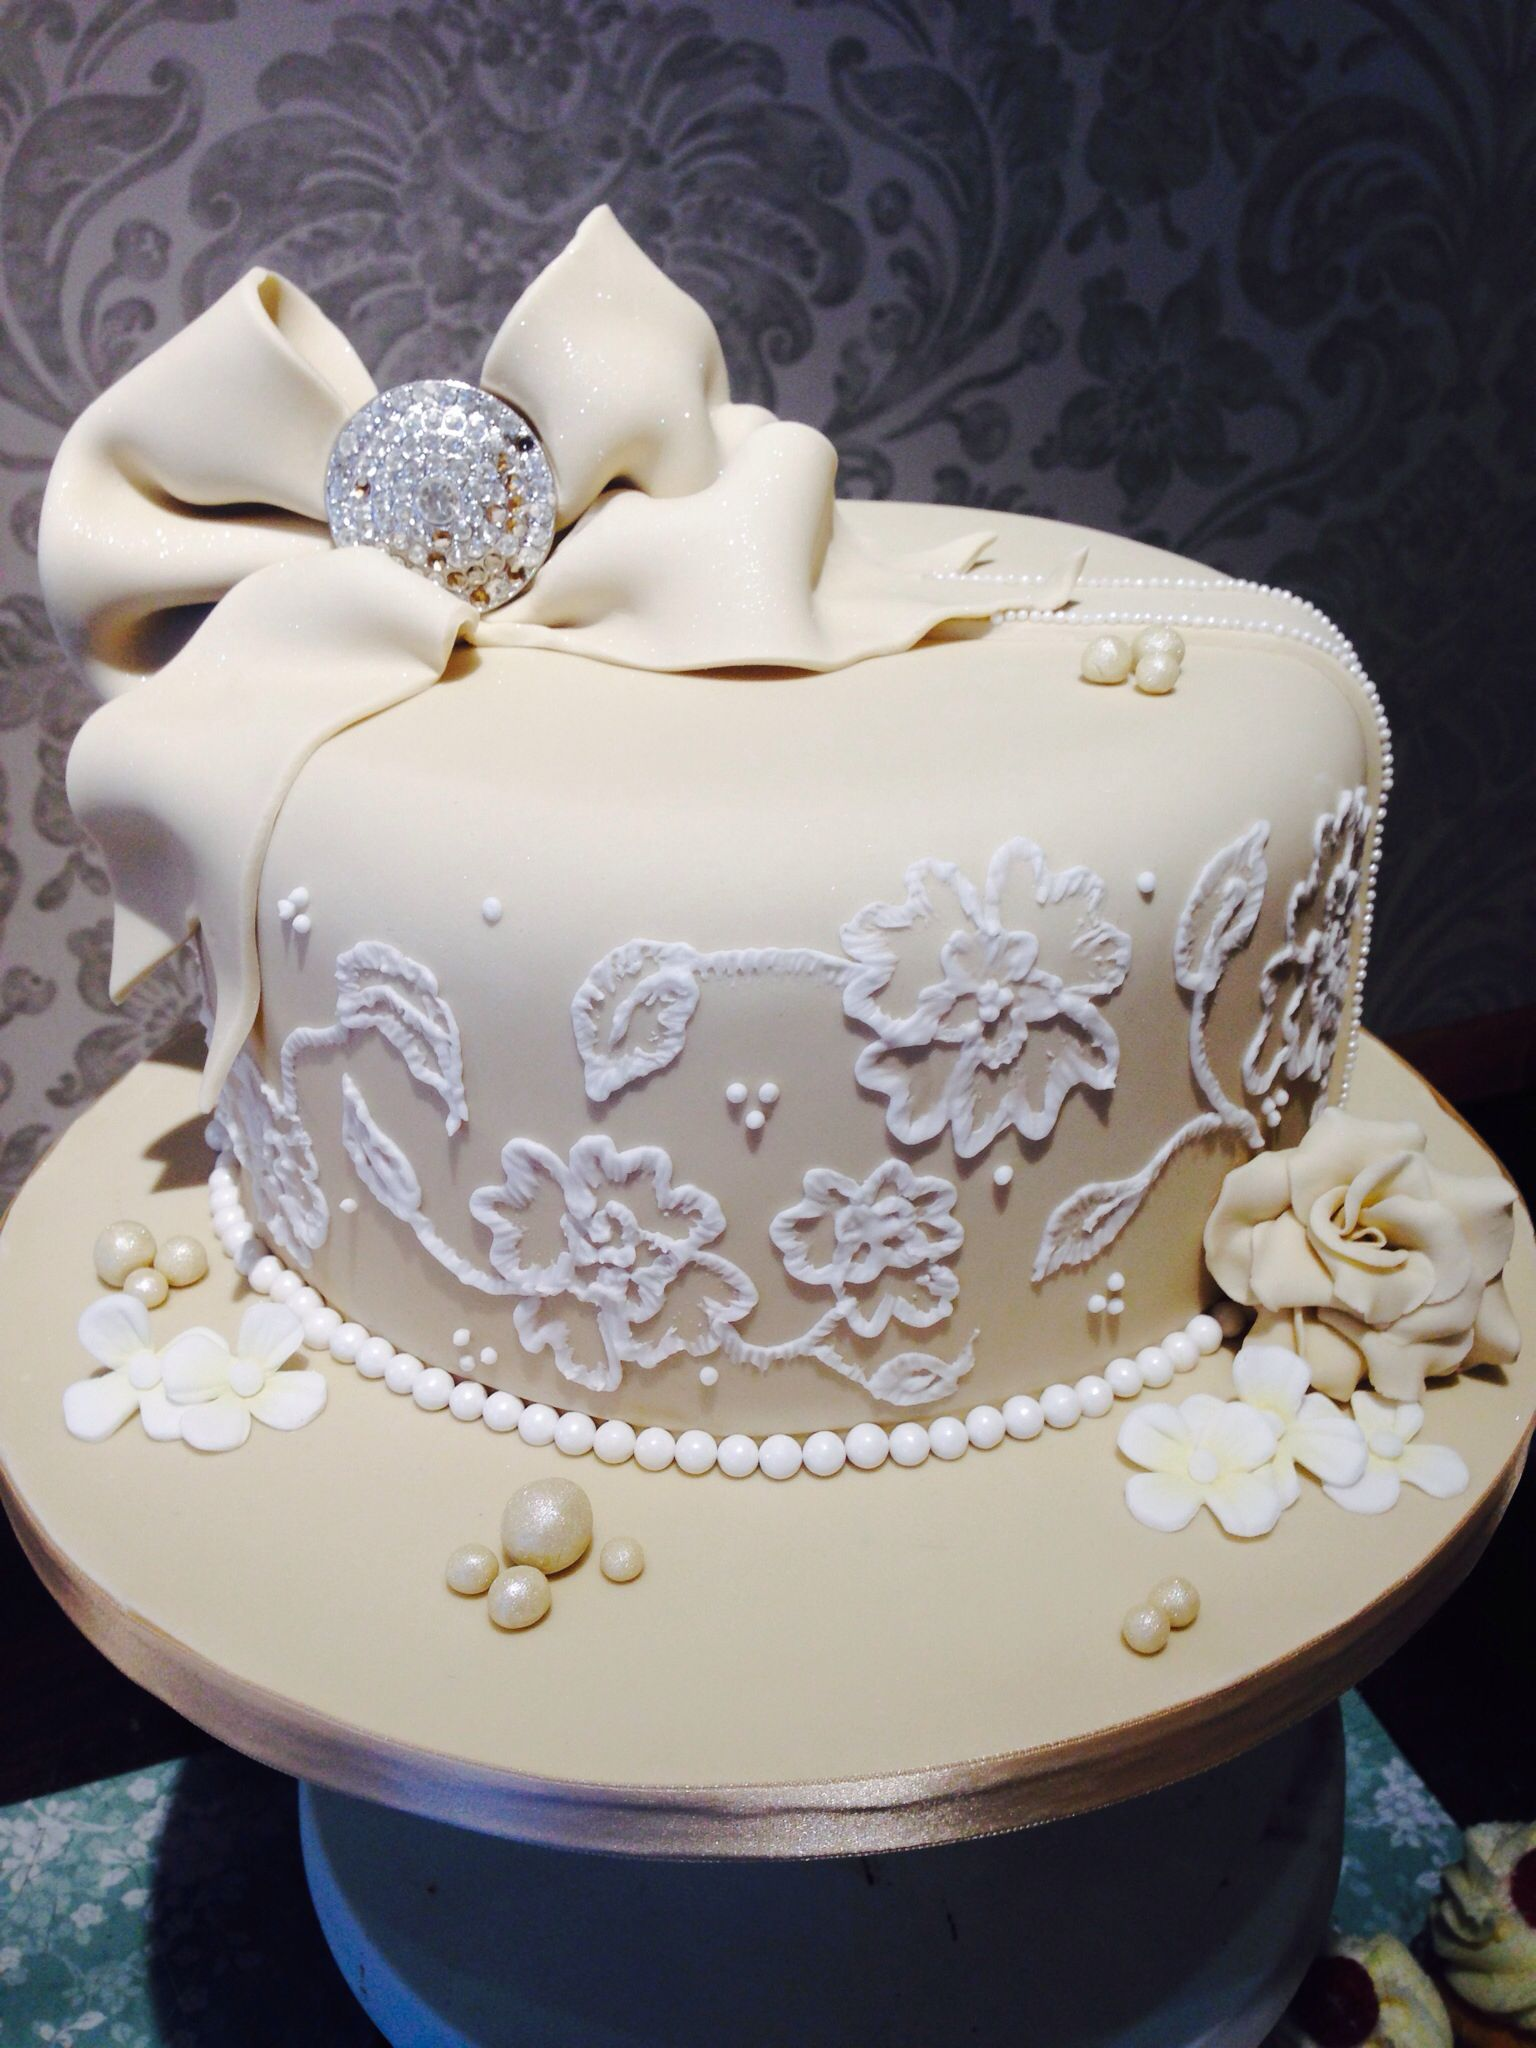 Elegant Brushed Embroidery Cake Brush Anniversary Ideas Wedding Blackberries Cakes